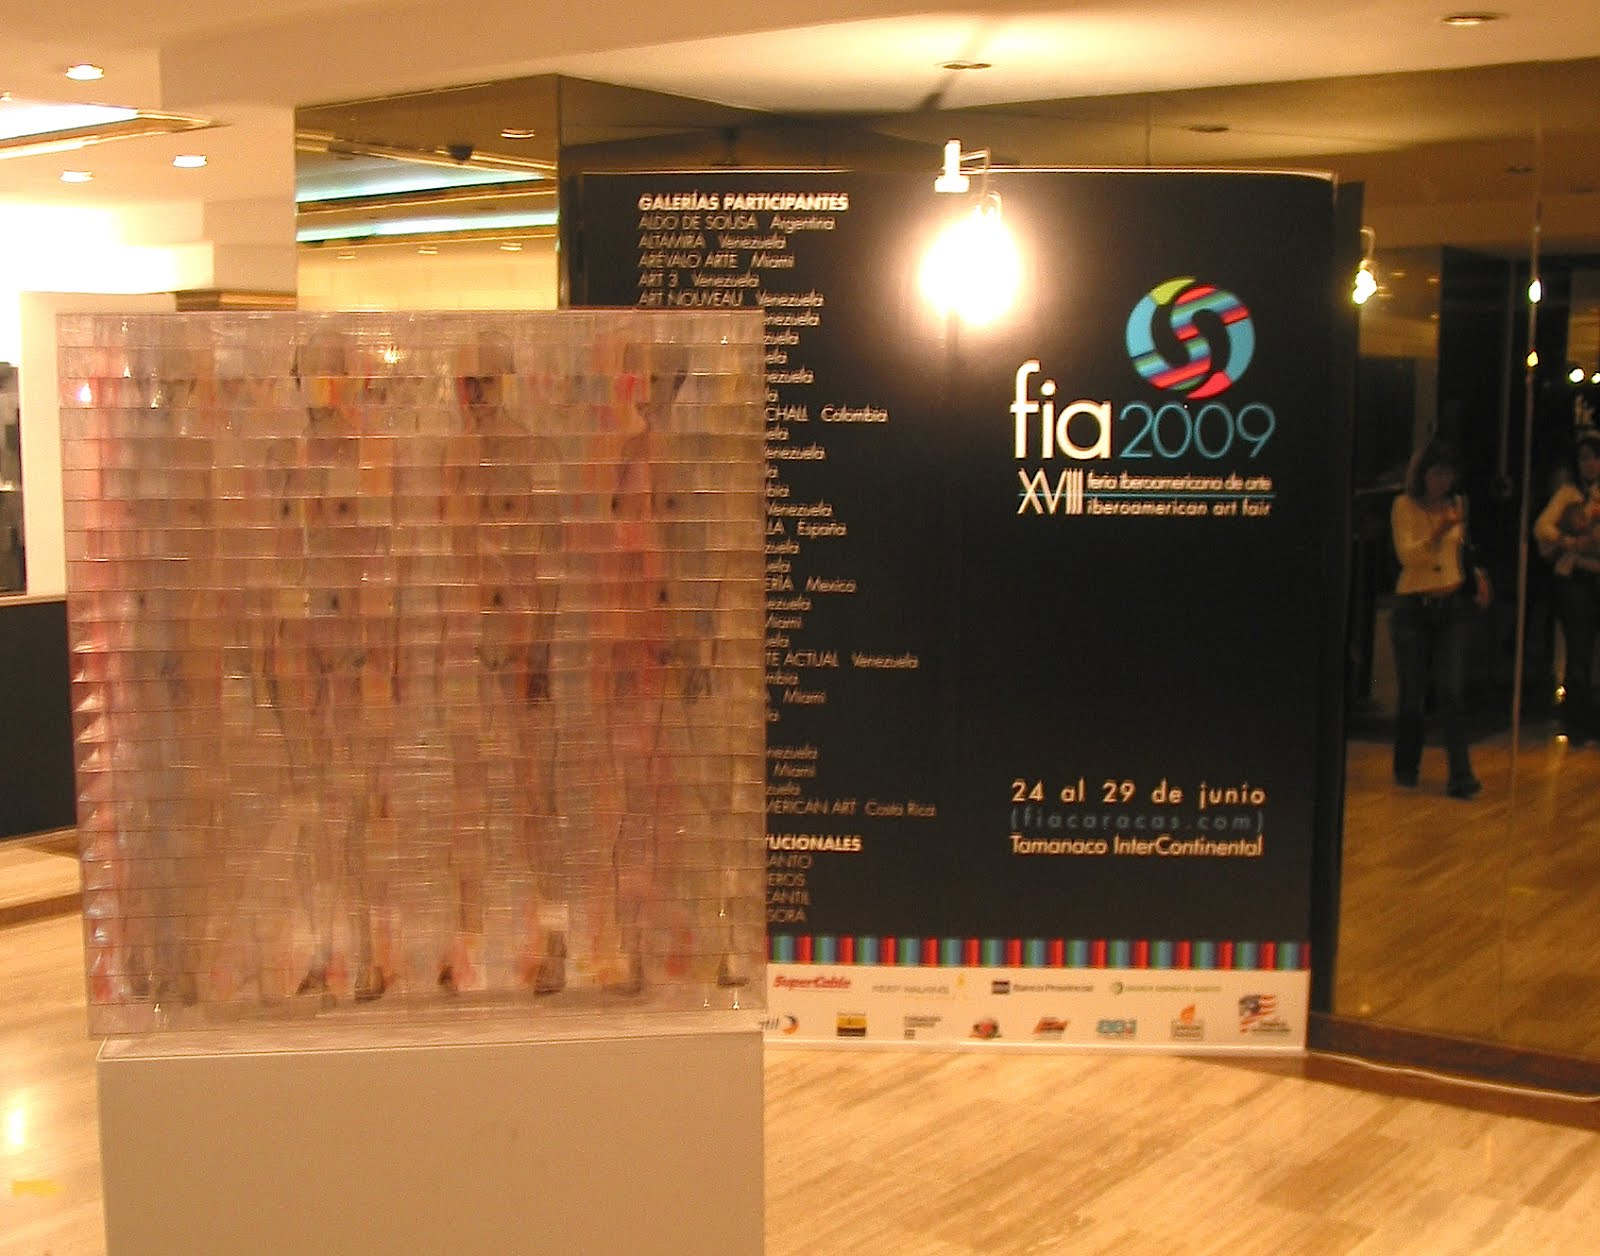 FIA 2009